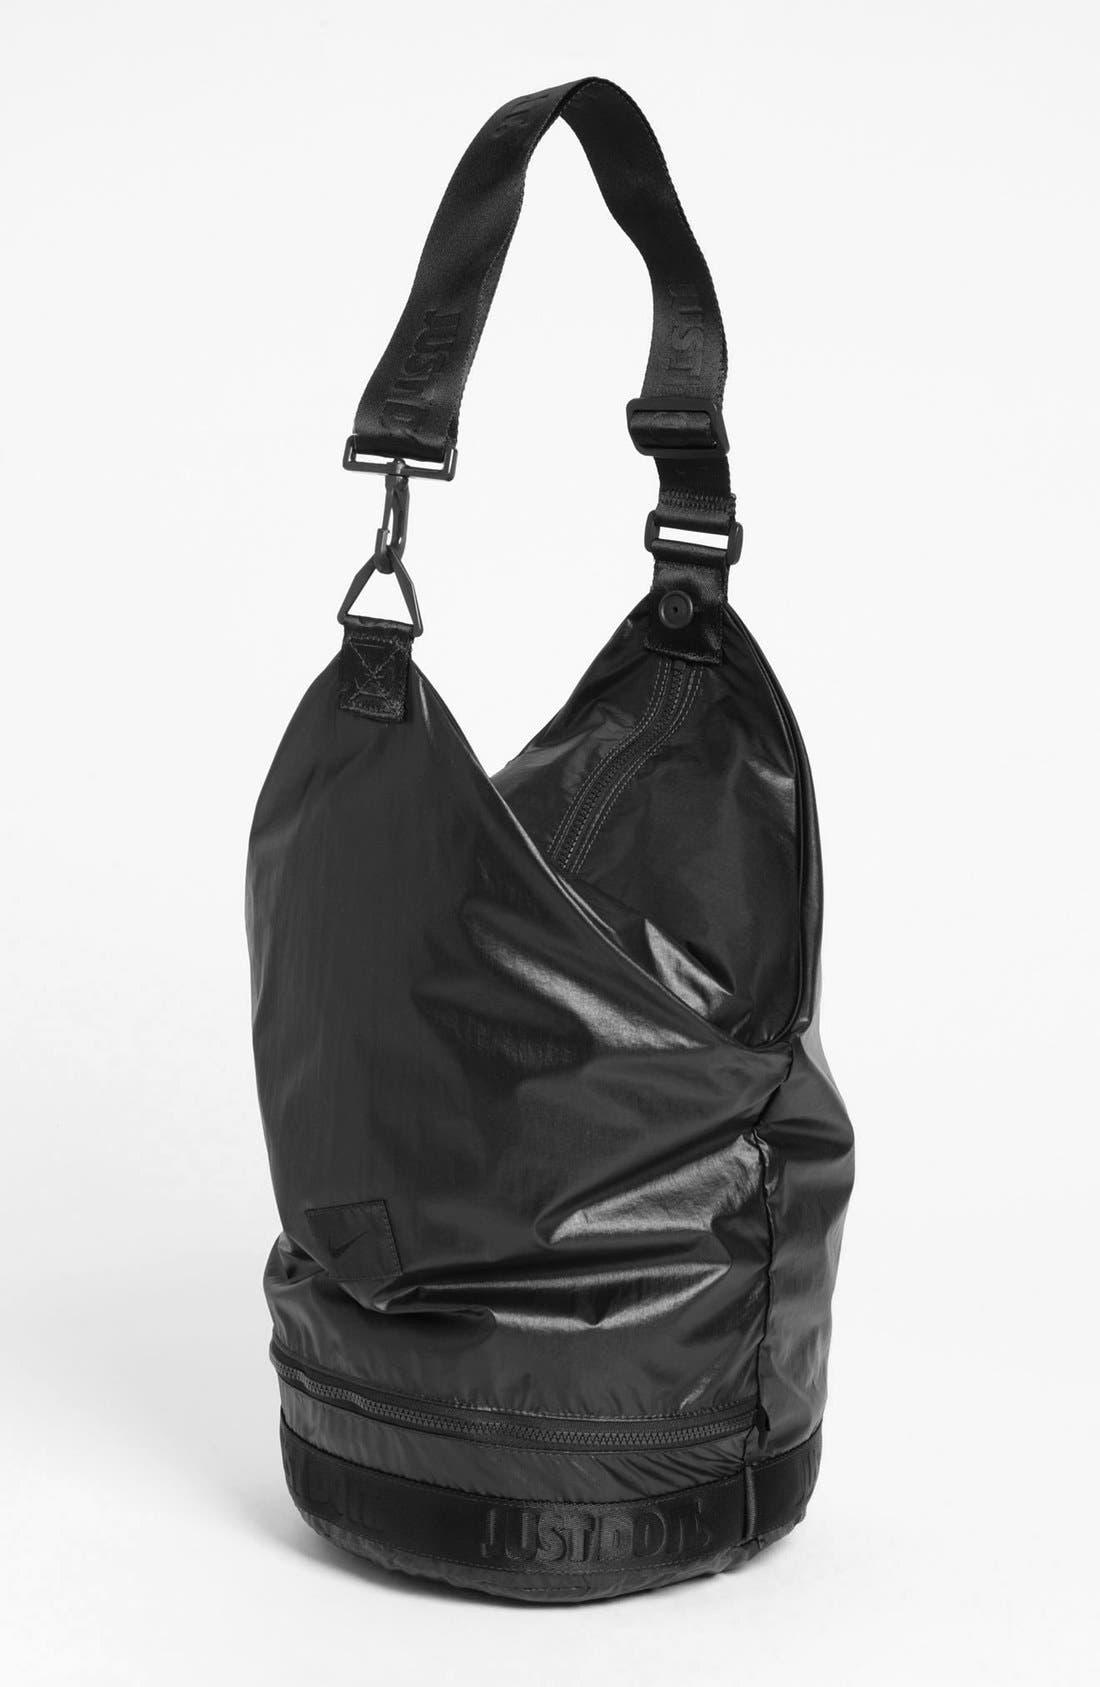 NIKE 'Bucket' Sling Bag, Main, color, 030